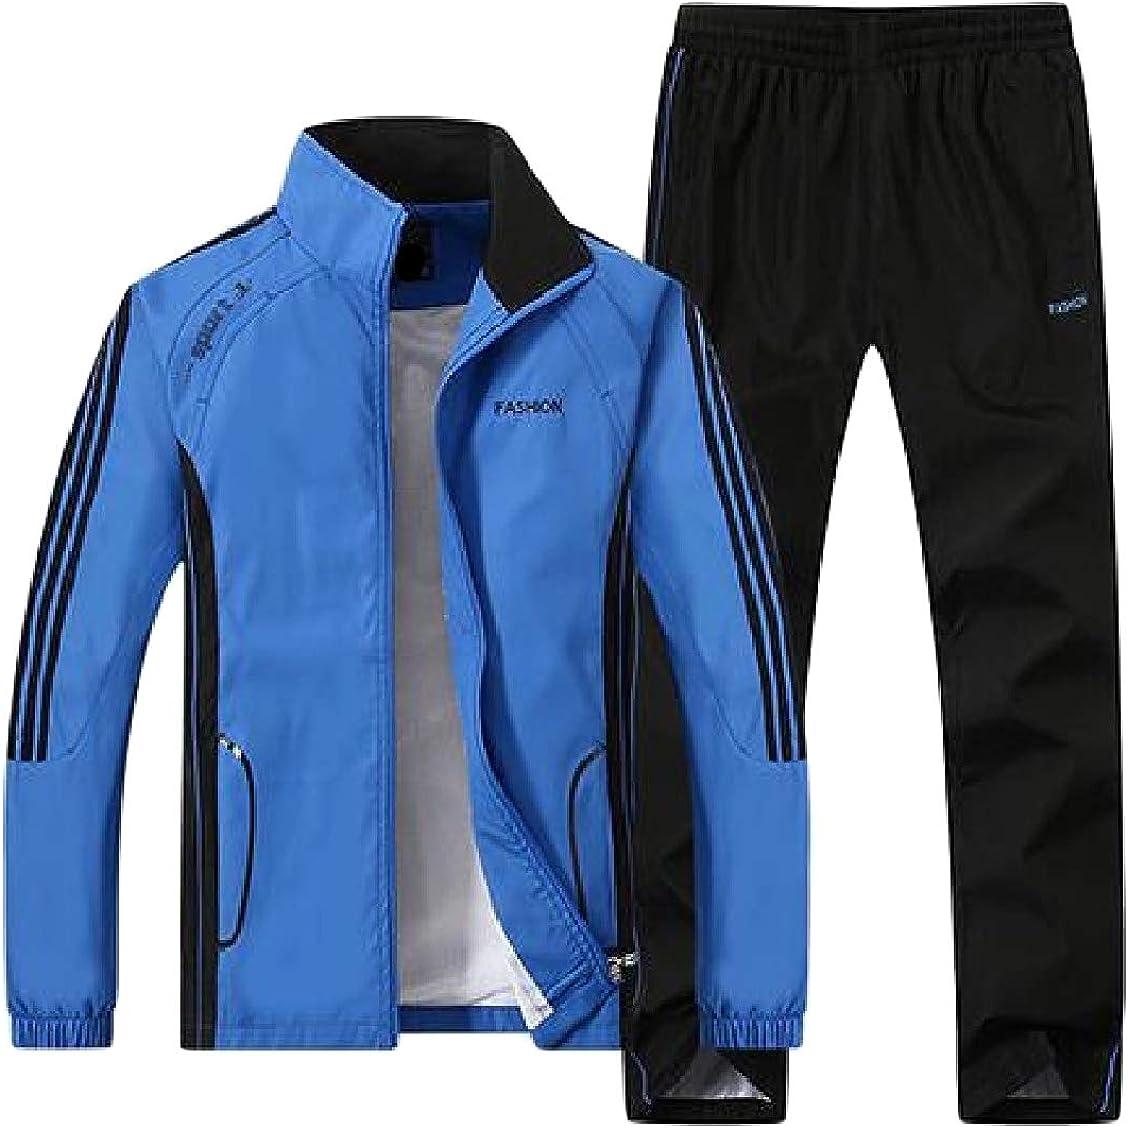 Hajotrawa Mens Sweatsuit Sweatpants 2 Pieces Sweatshirt Sport Tracksuit Set